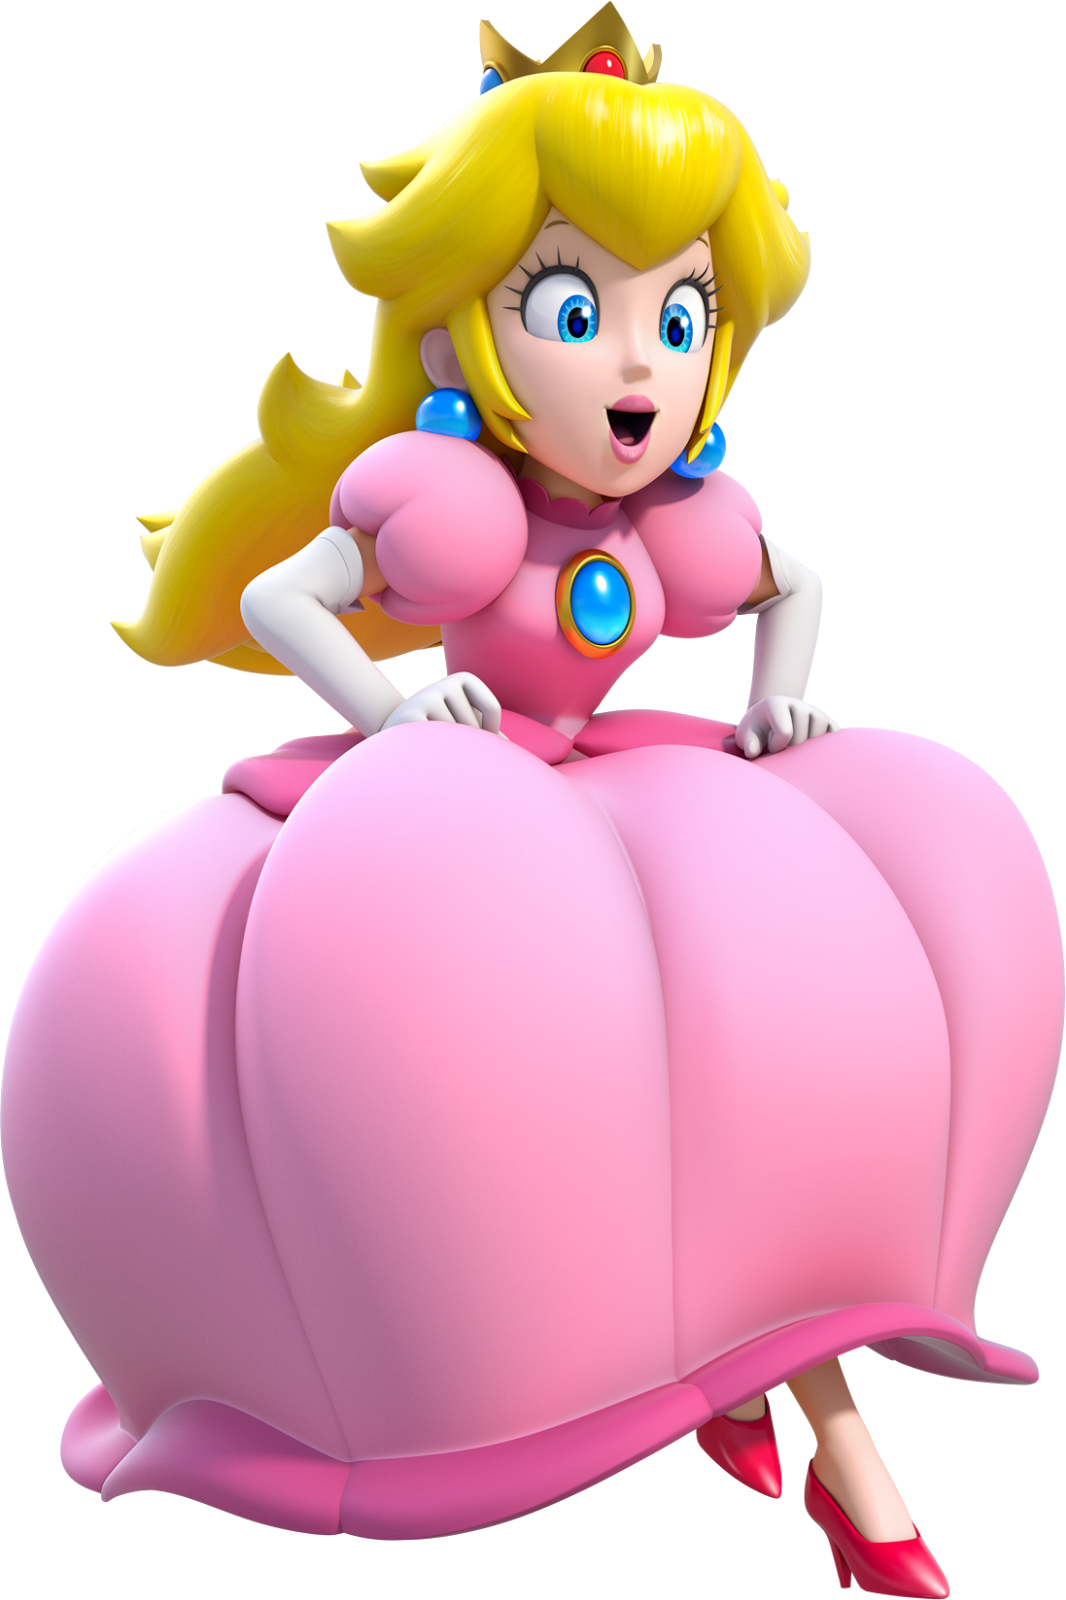 Princess peach footjob